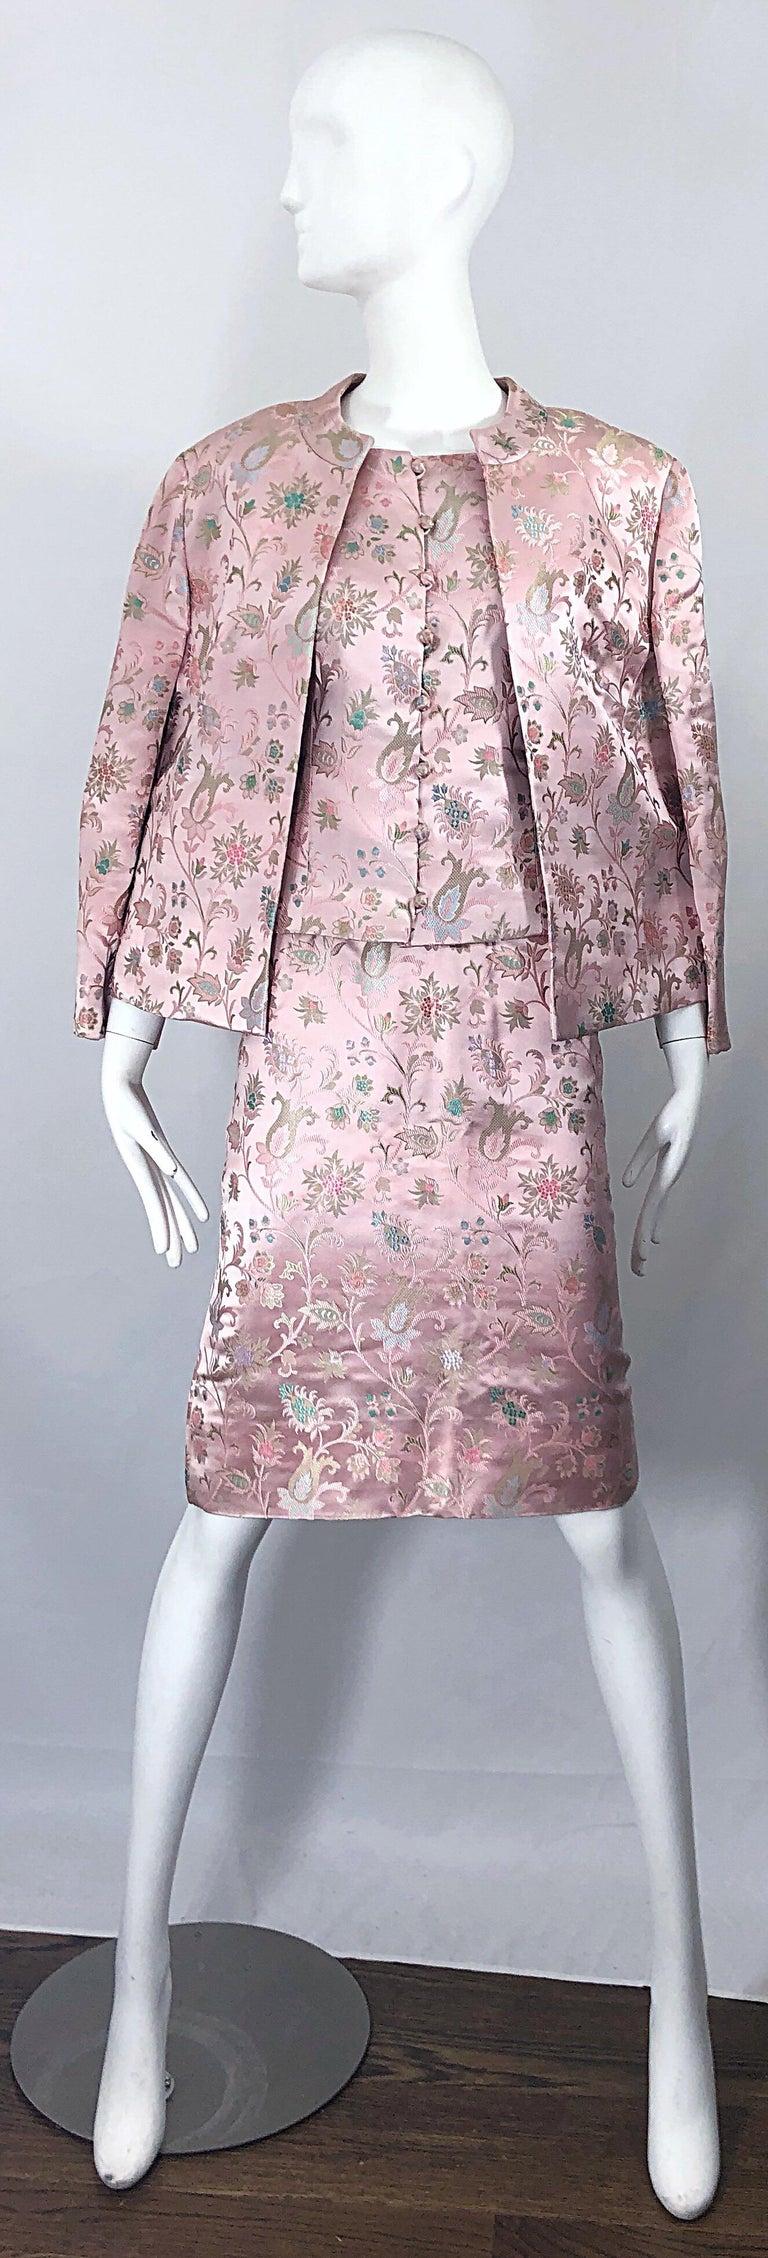 Dynasty 1960s For Lord & Taylor Light Pink Large Size 3 Piece Vintage Dress Set For Sale 15